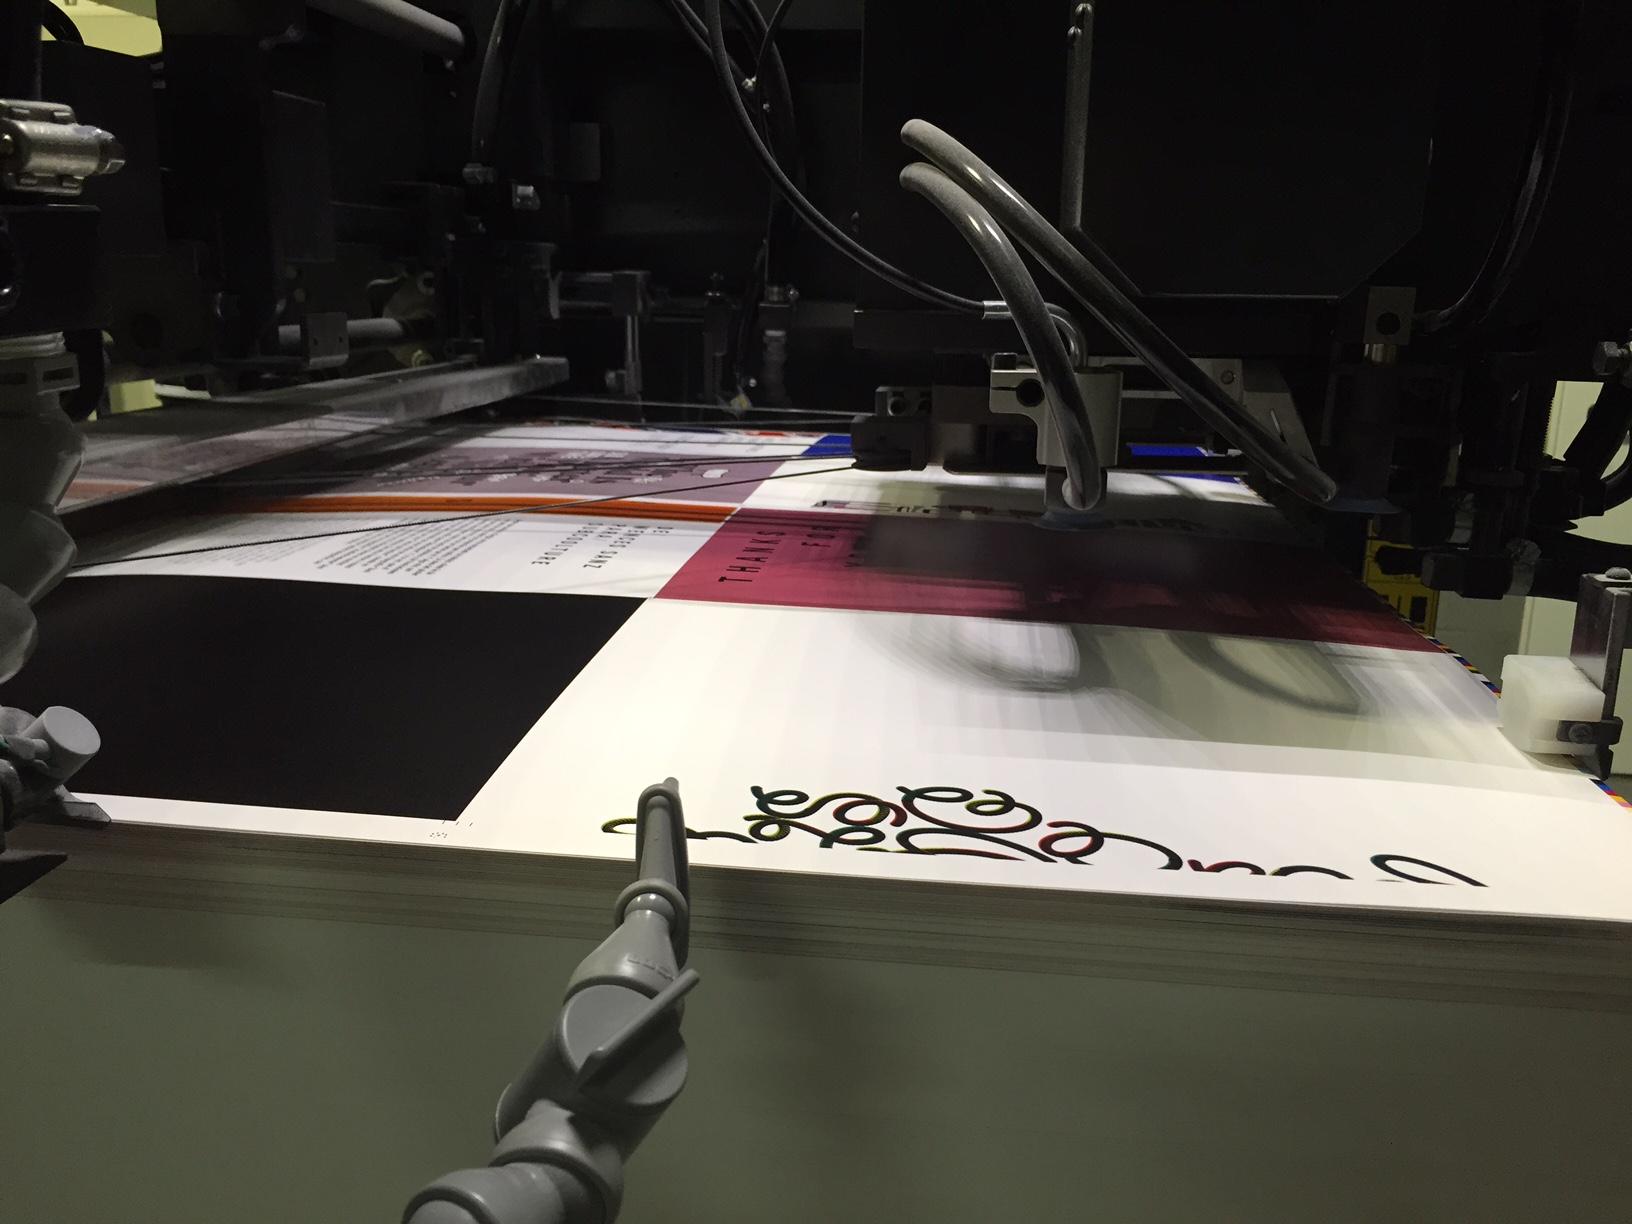 ¡The Good Paper Chain Book ya está en imprenta!